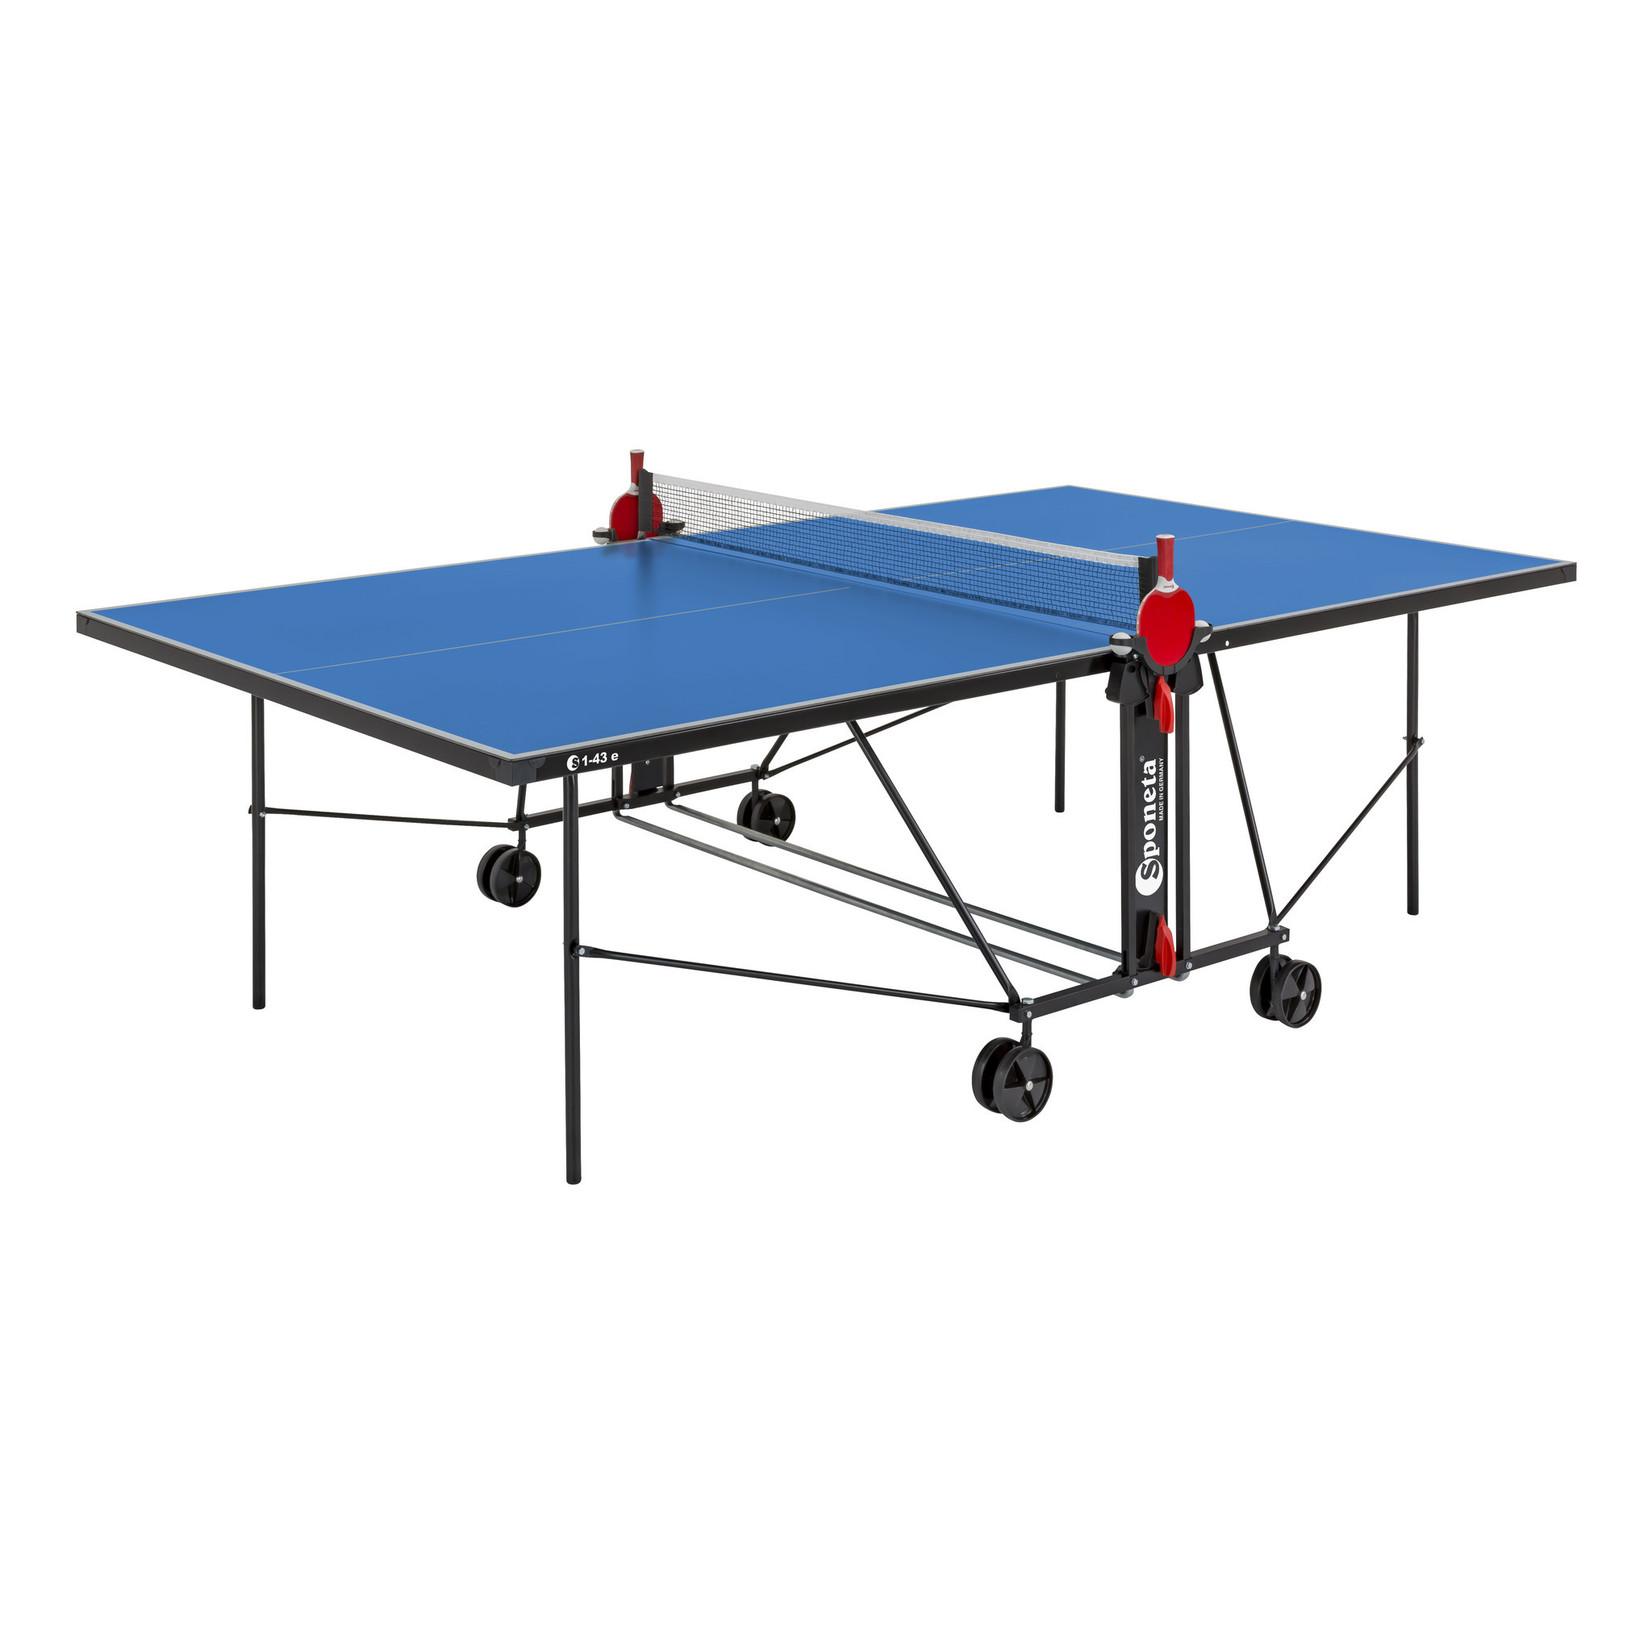 Sponeta Outdoor tafeltennistafel - Sponeta S 1-43 e